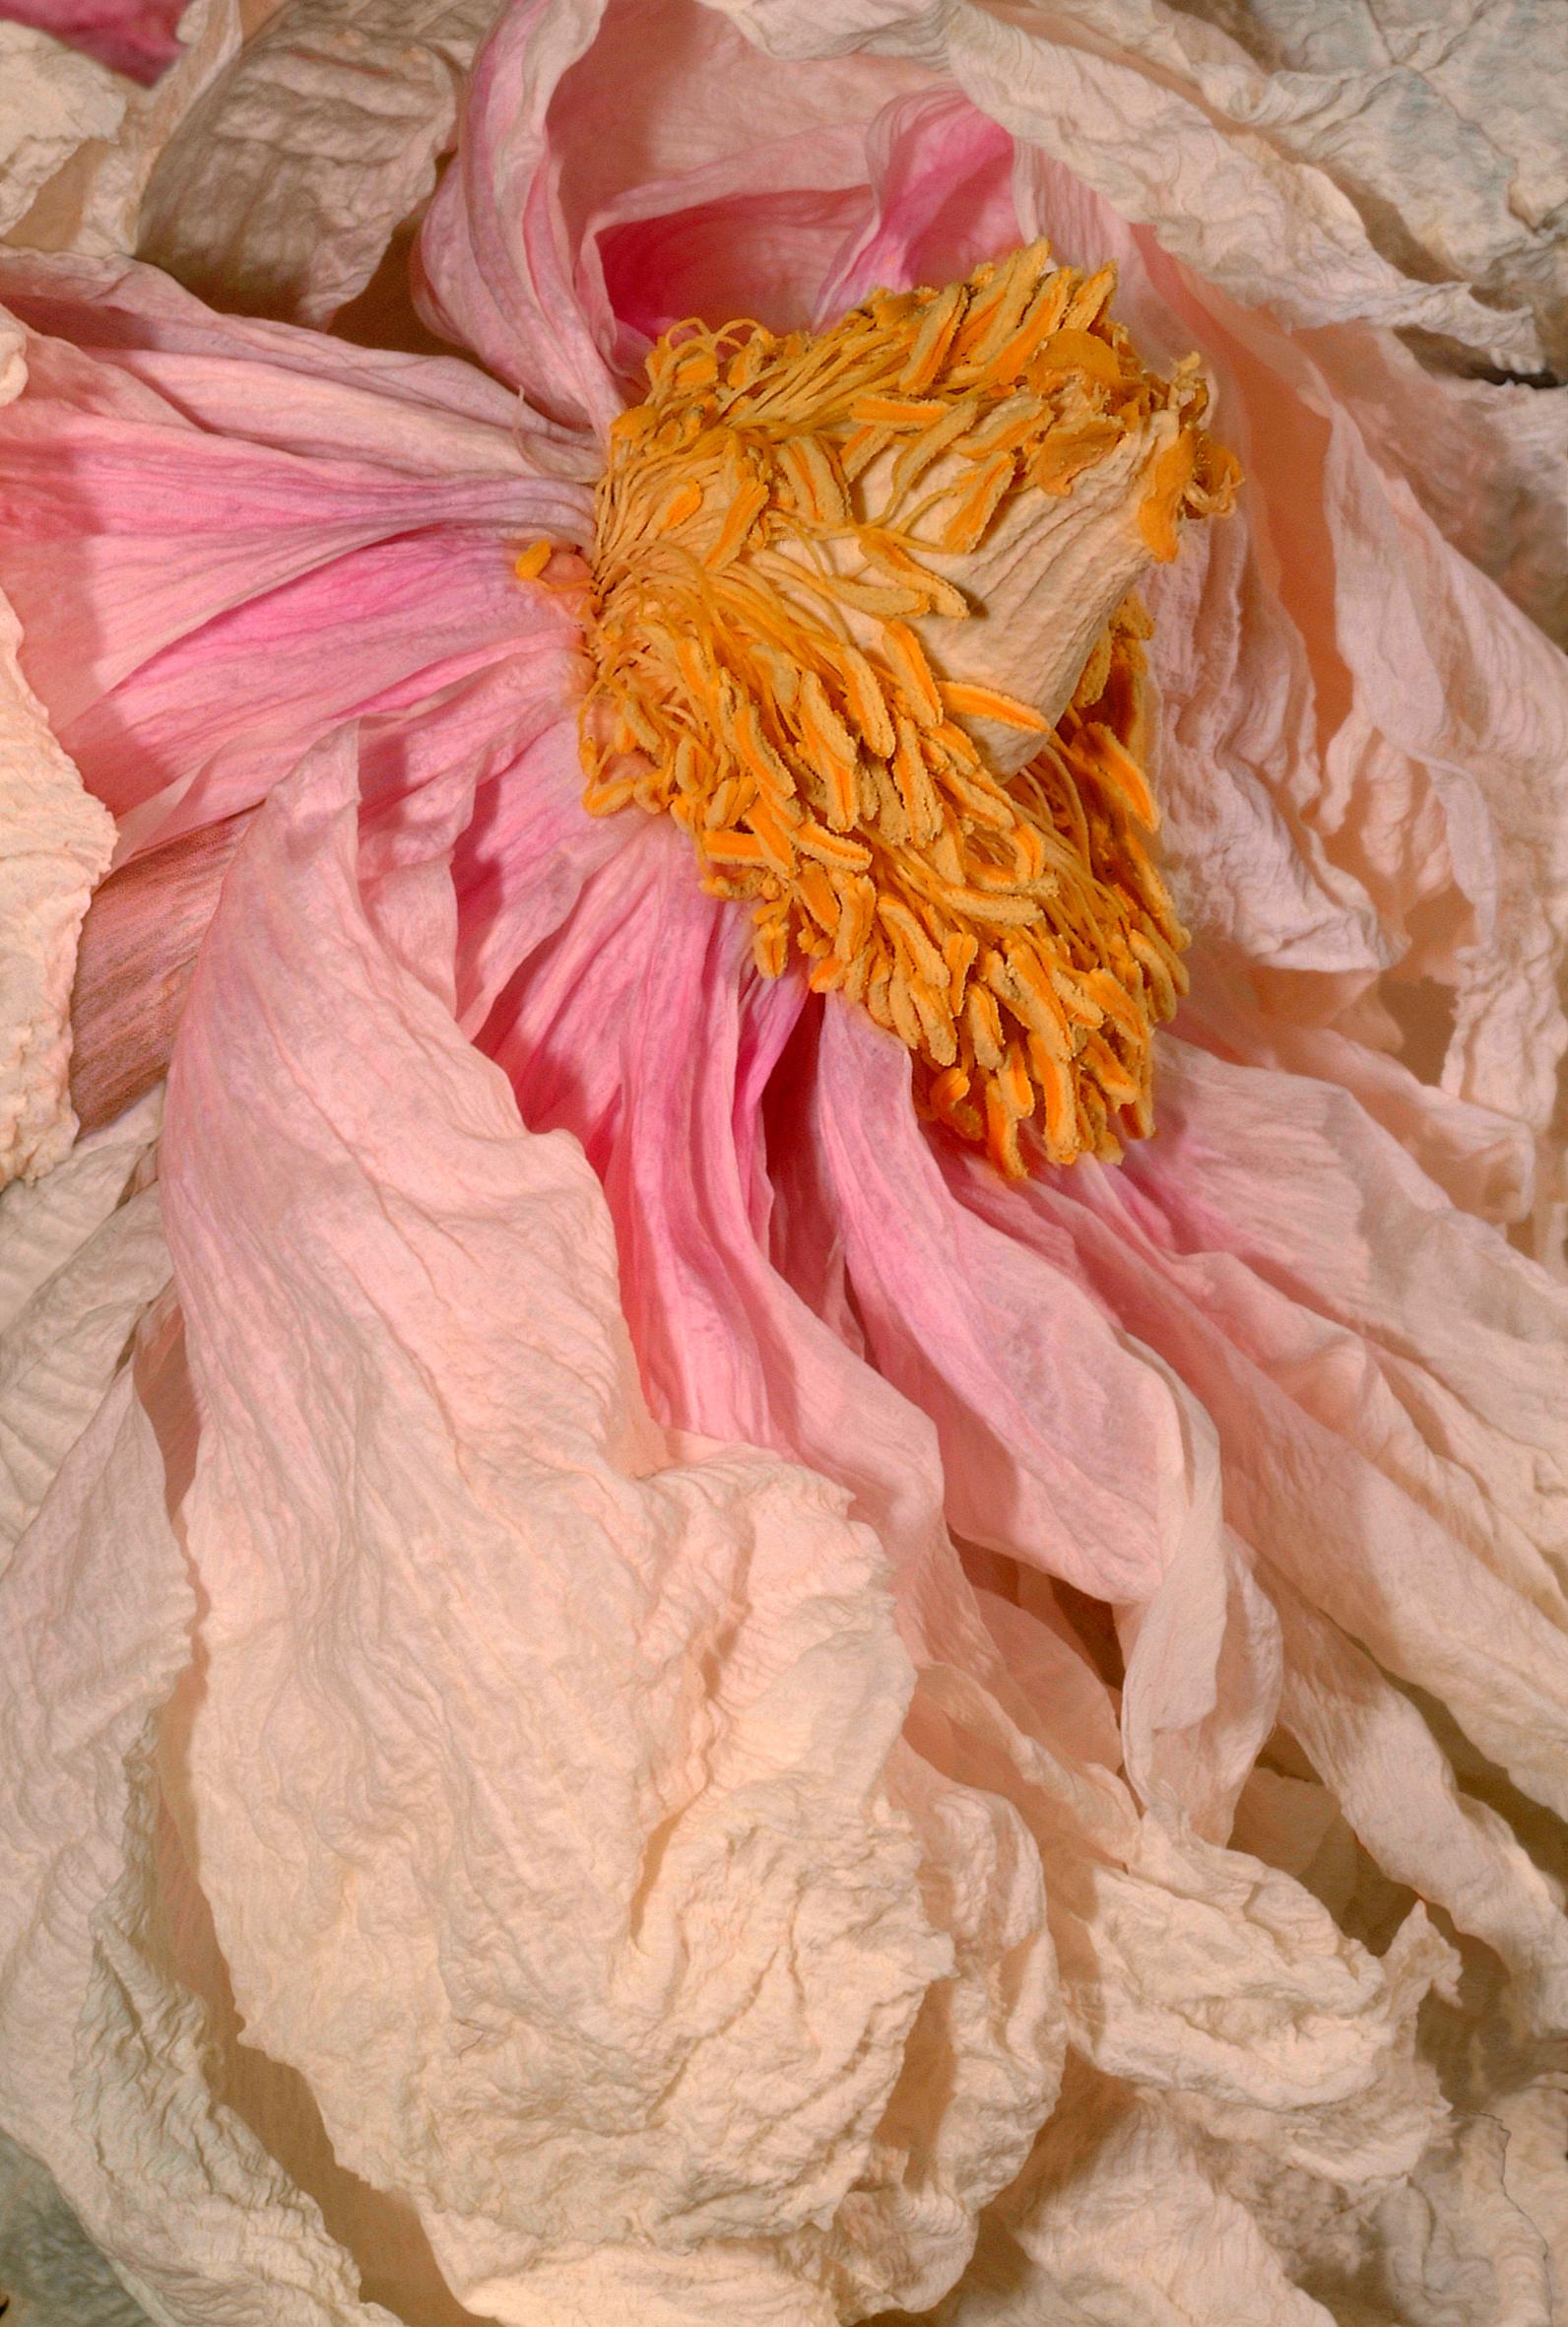 Blossom_Anna-Halm-Schudel_Cover_Pfingstrose-Blumenmeer.jpg